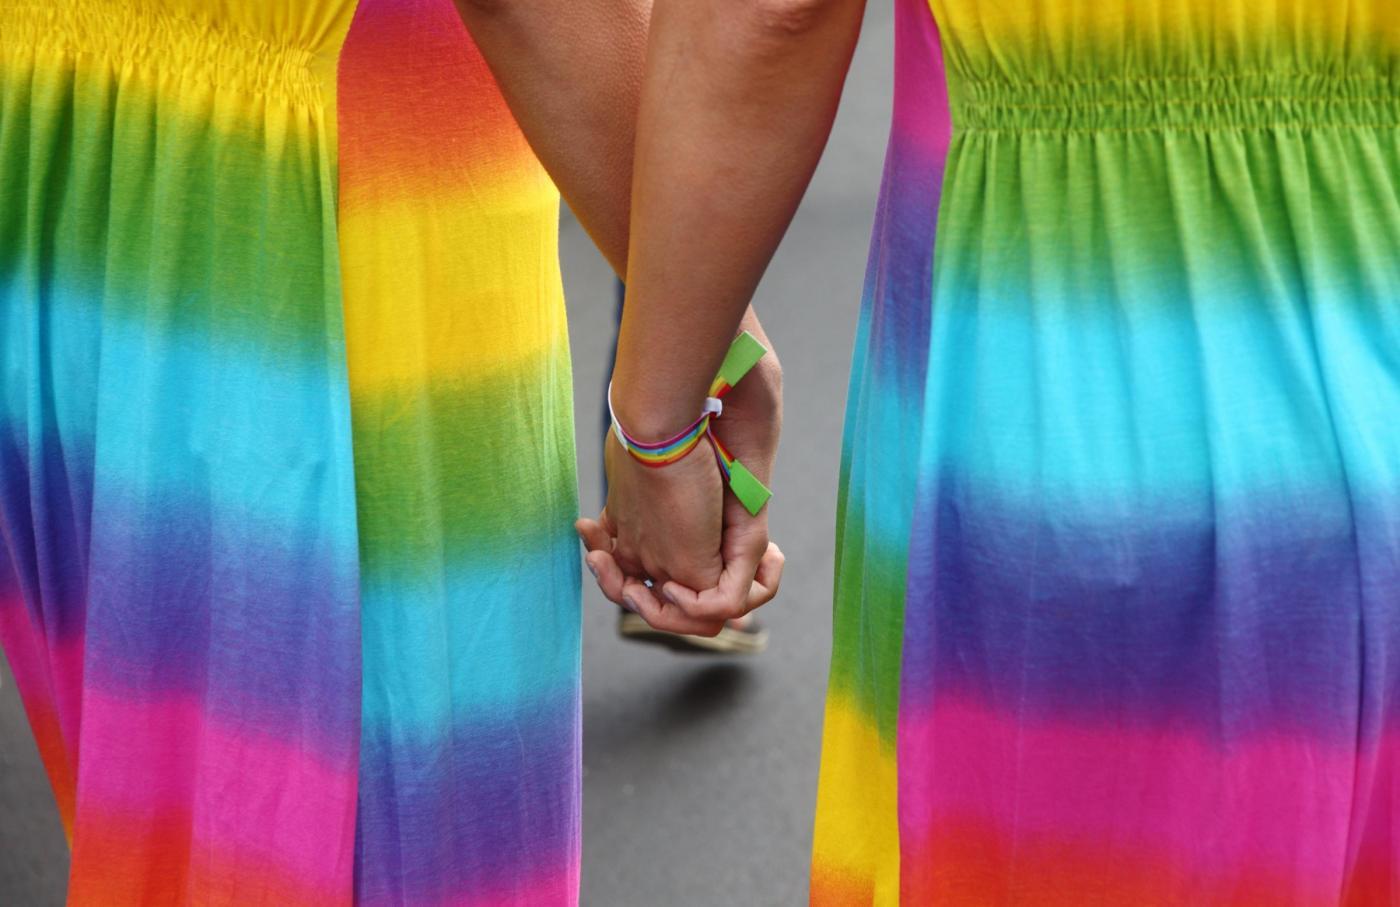 Nozze gay legali in USA 150x150